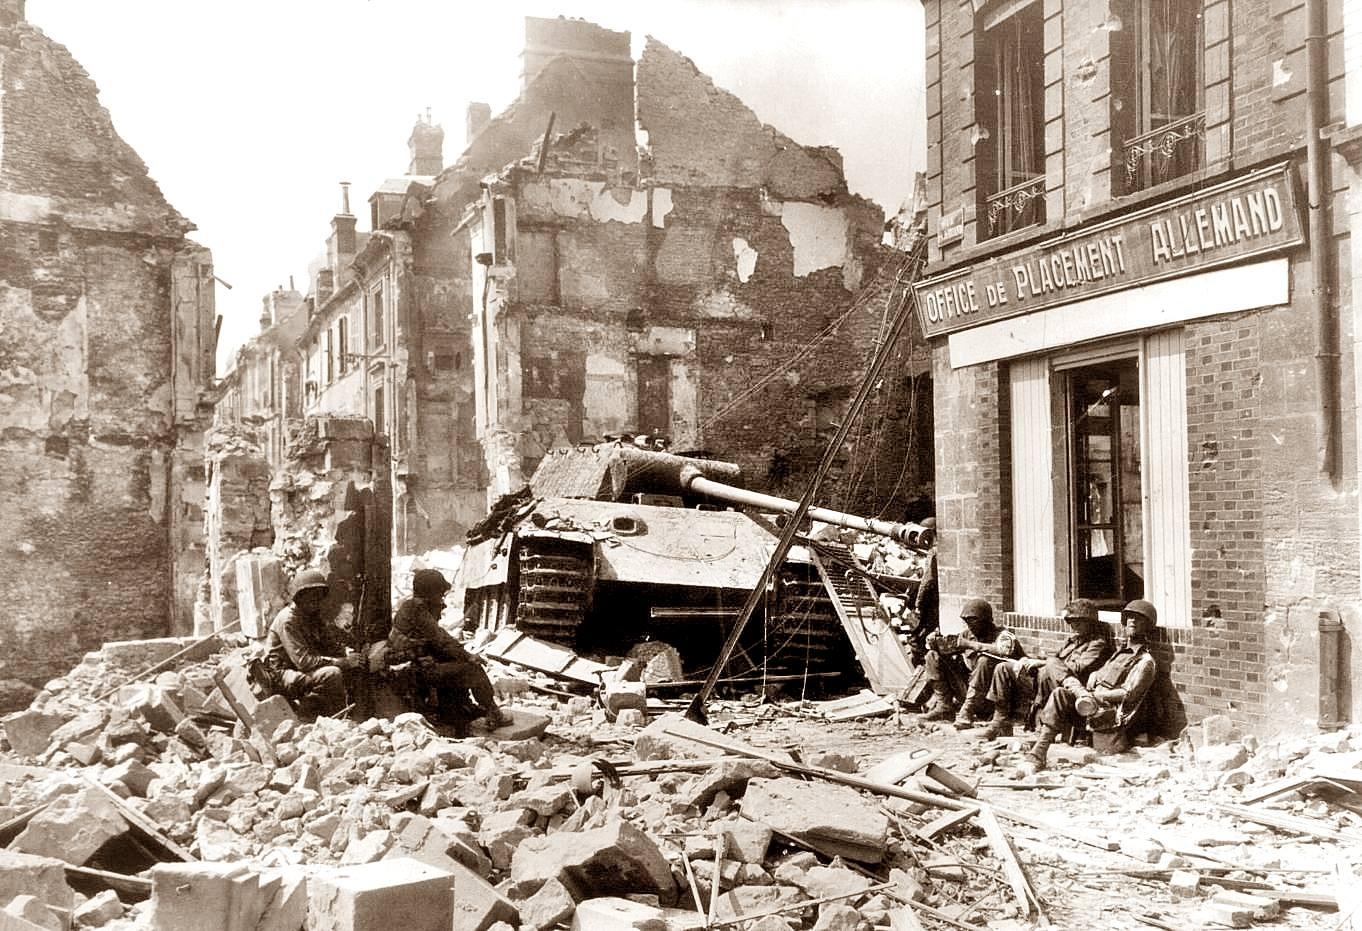 gi-s-break-1944-argentan-panther-tank-116th-panzer-div